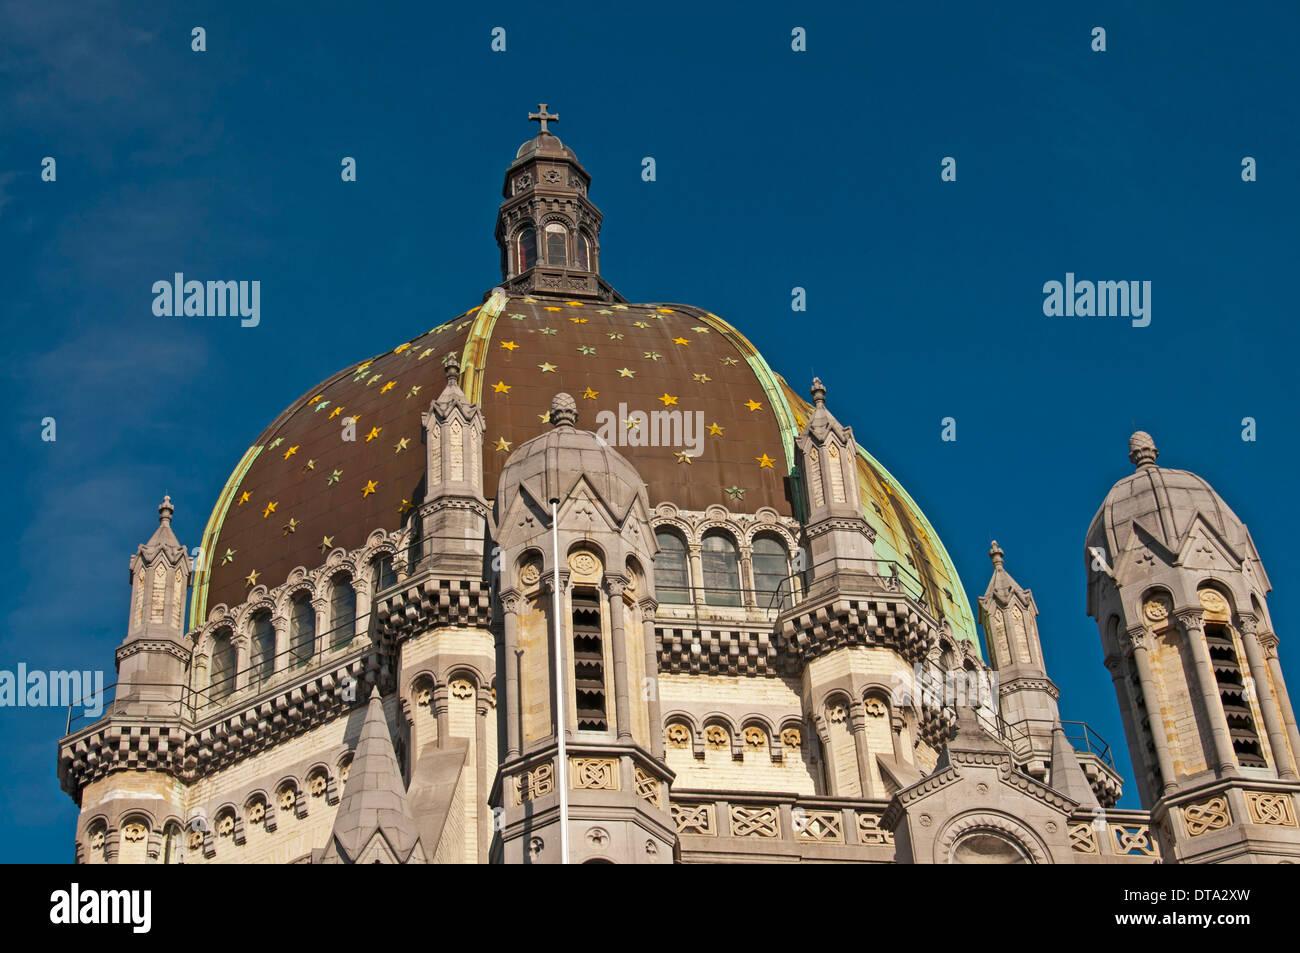 Église Royale Sainte-Marie, Koninklijke Sint-Mariakerk or St. Mary's Royal Church with a large dome, Schaerbeek, Schaarbeek - Stock Image